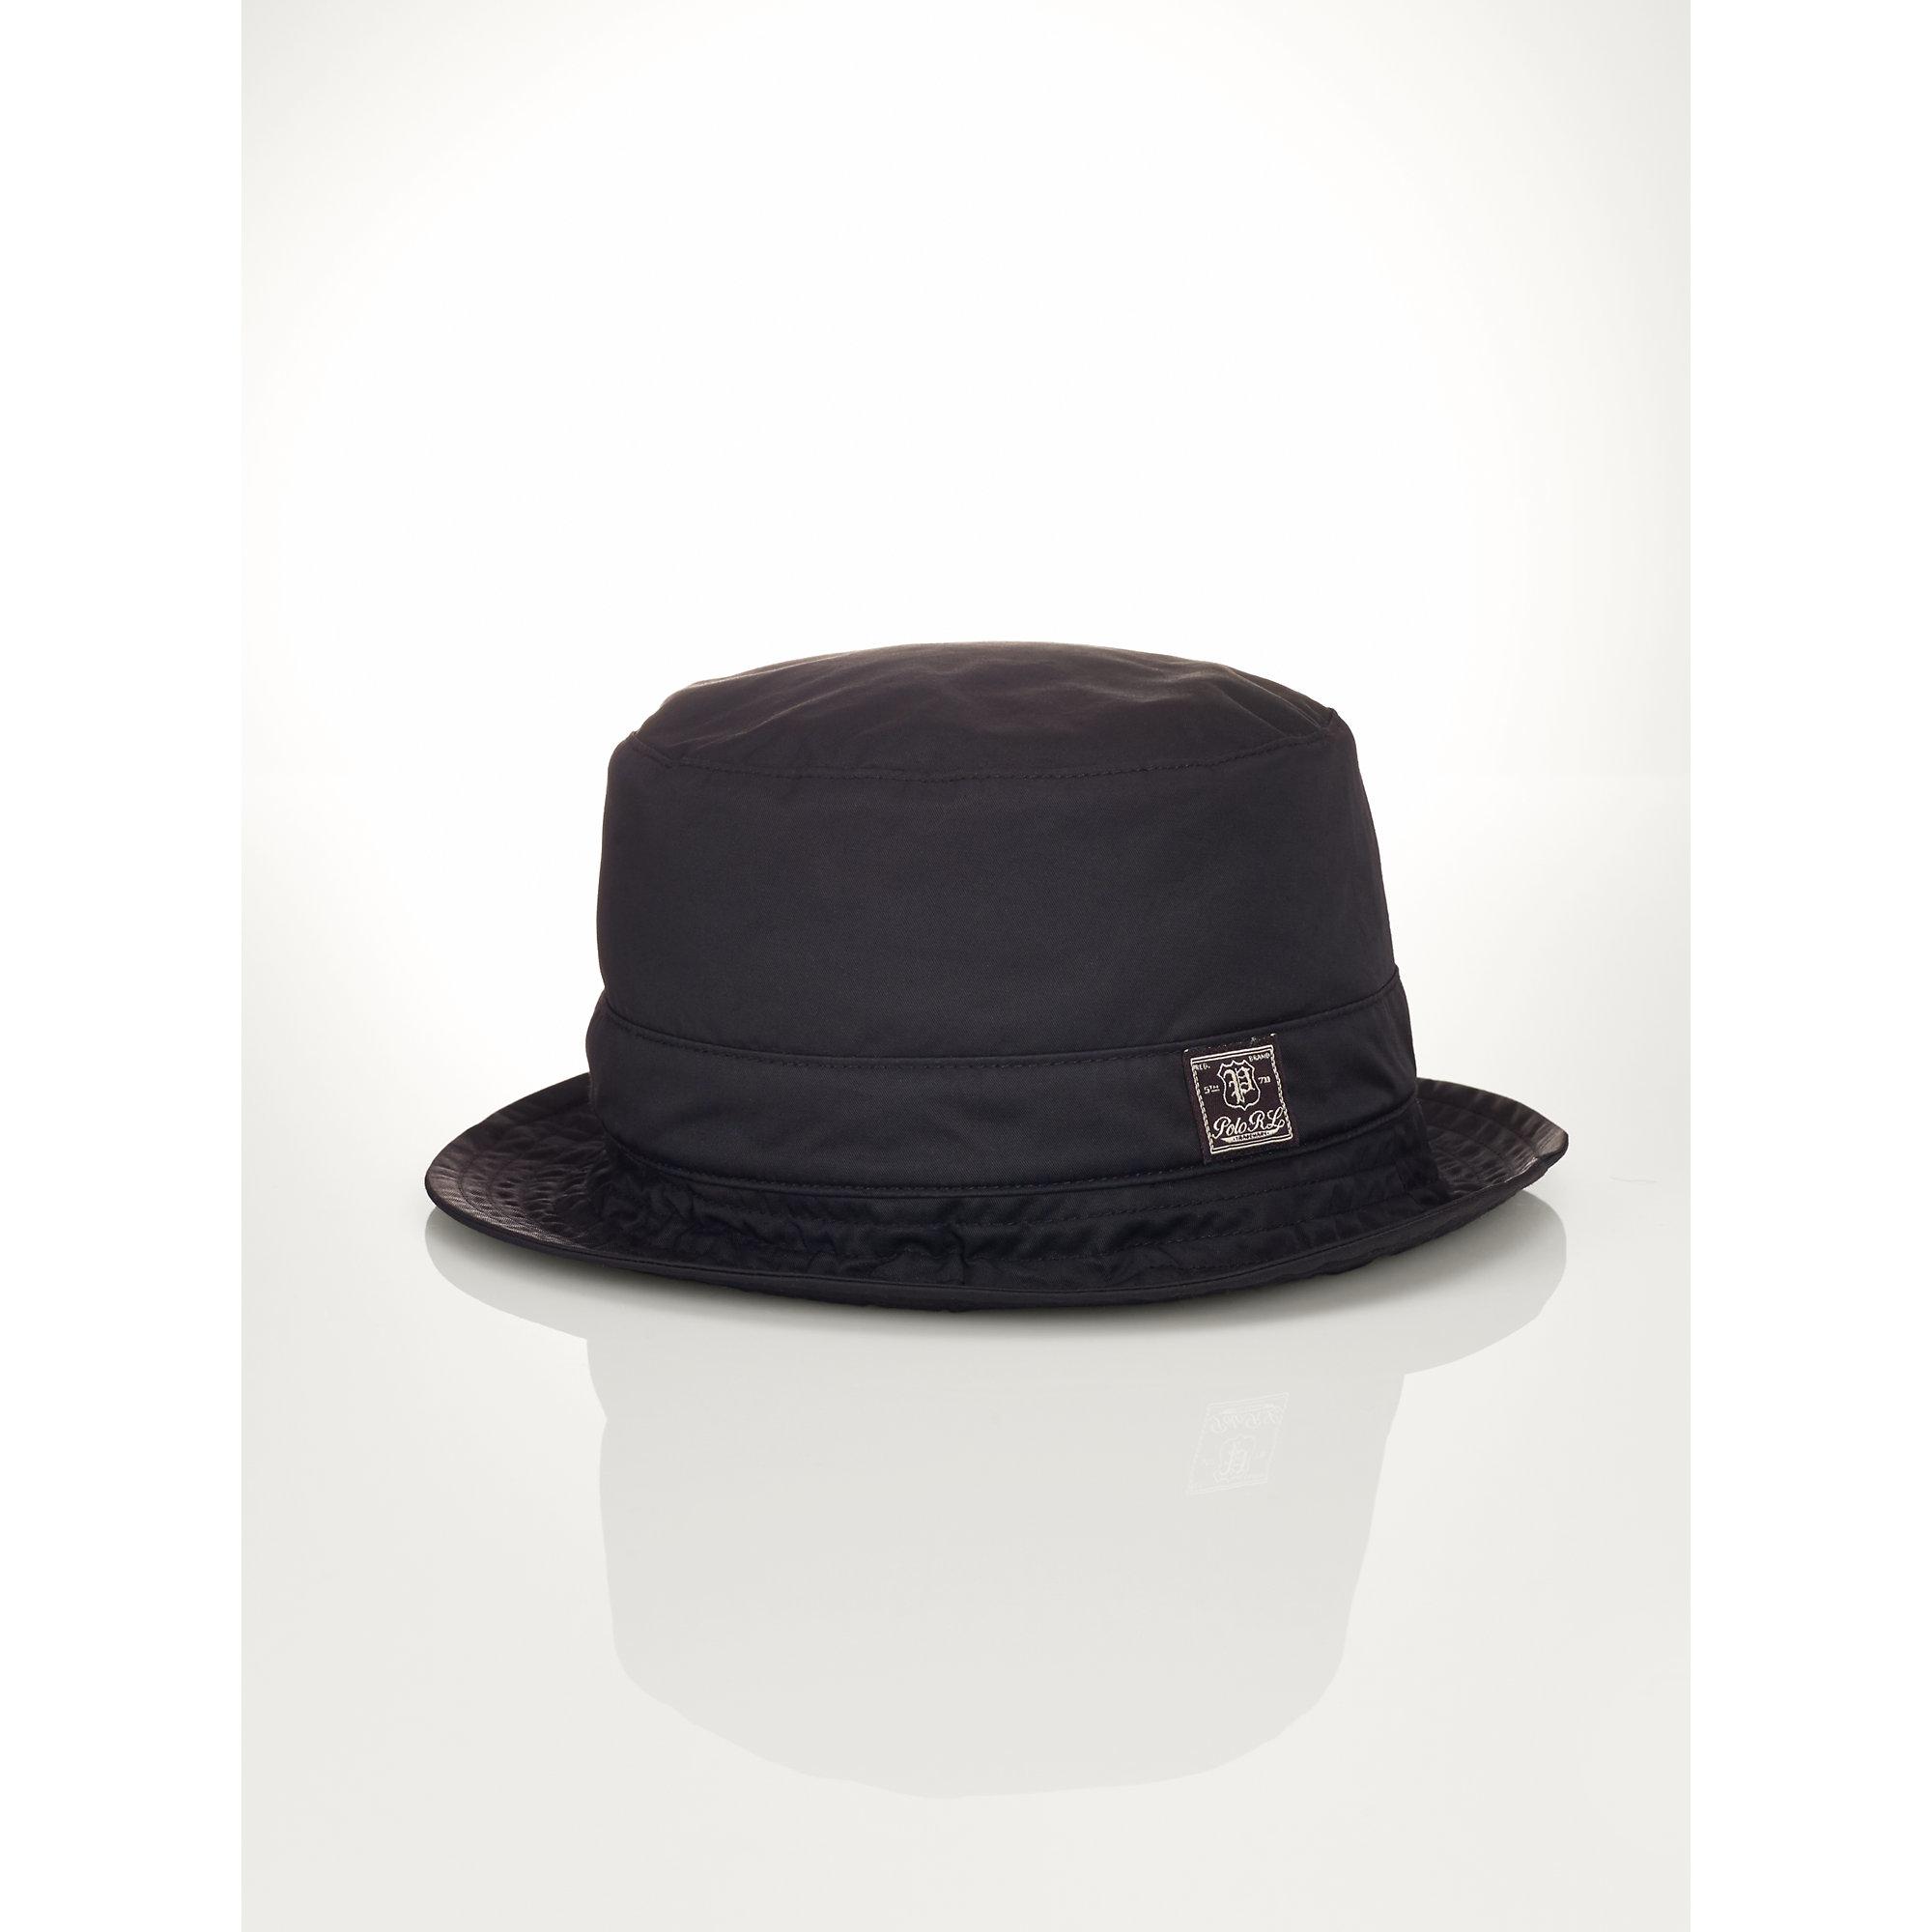 Lyst - Polo Ralph Lauren Nylon Twill Bucket Hat in Black for Men d03e8d21102